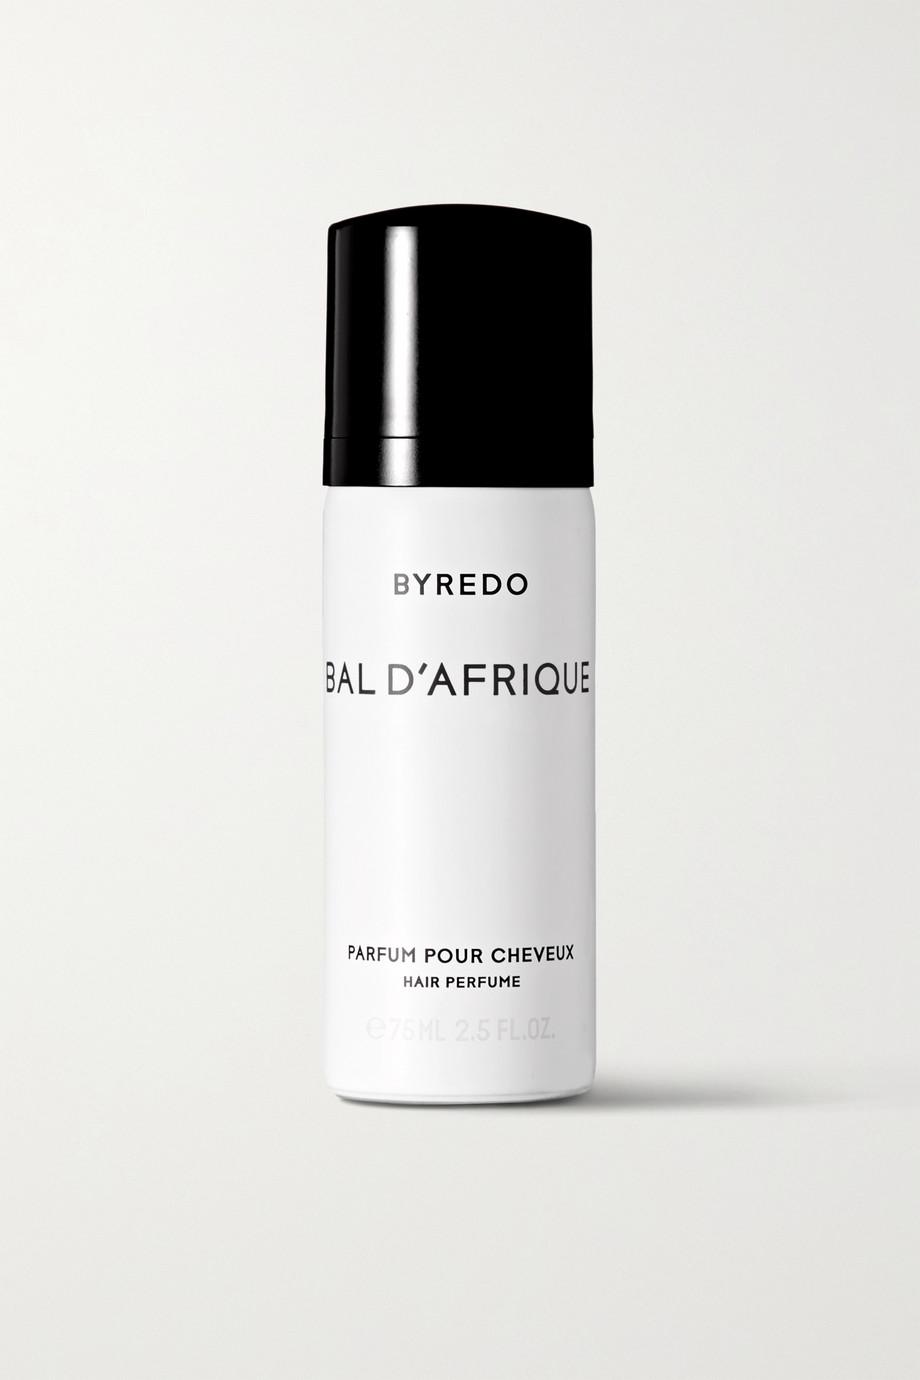 Byredo Hair Perfume - Bal d'Afrique, 75ml